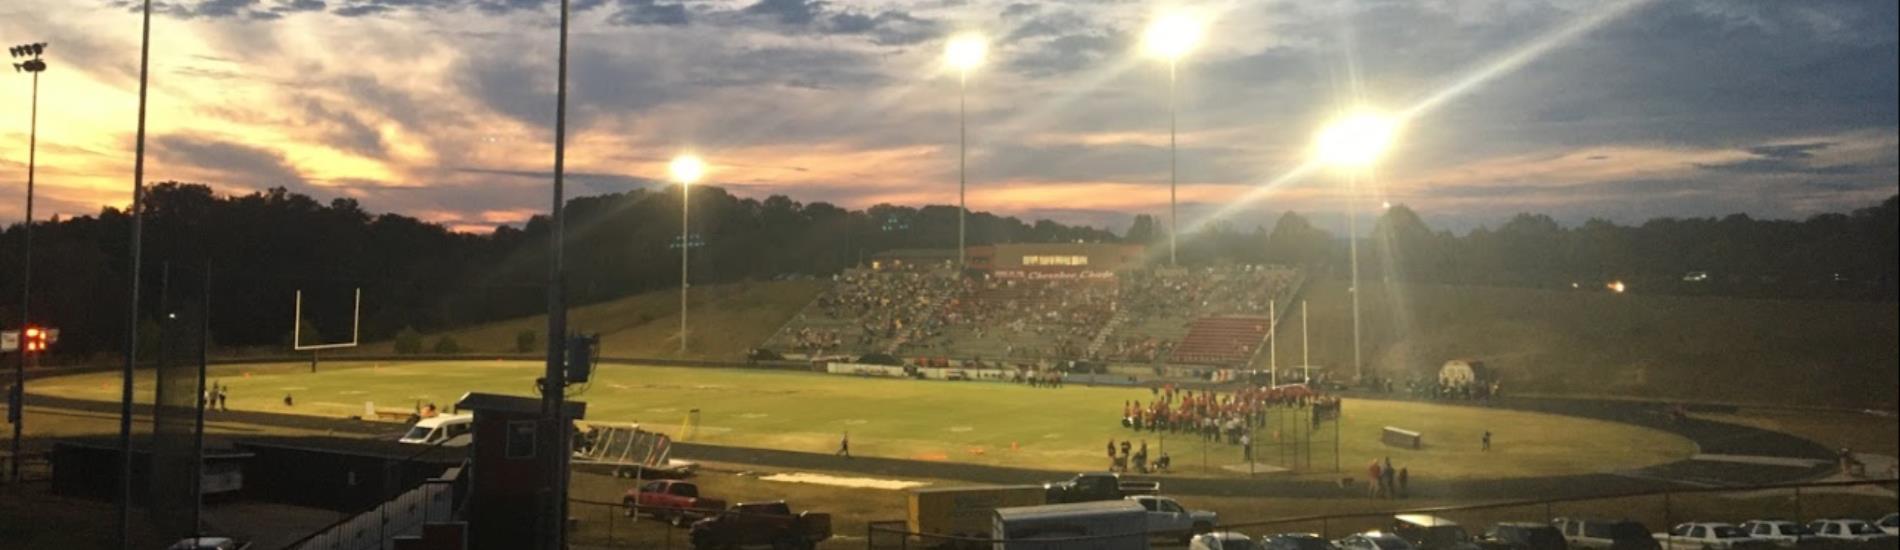 Cherokee high school football field